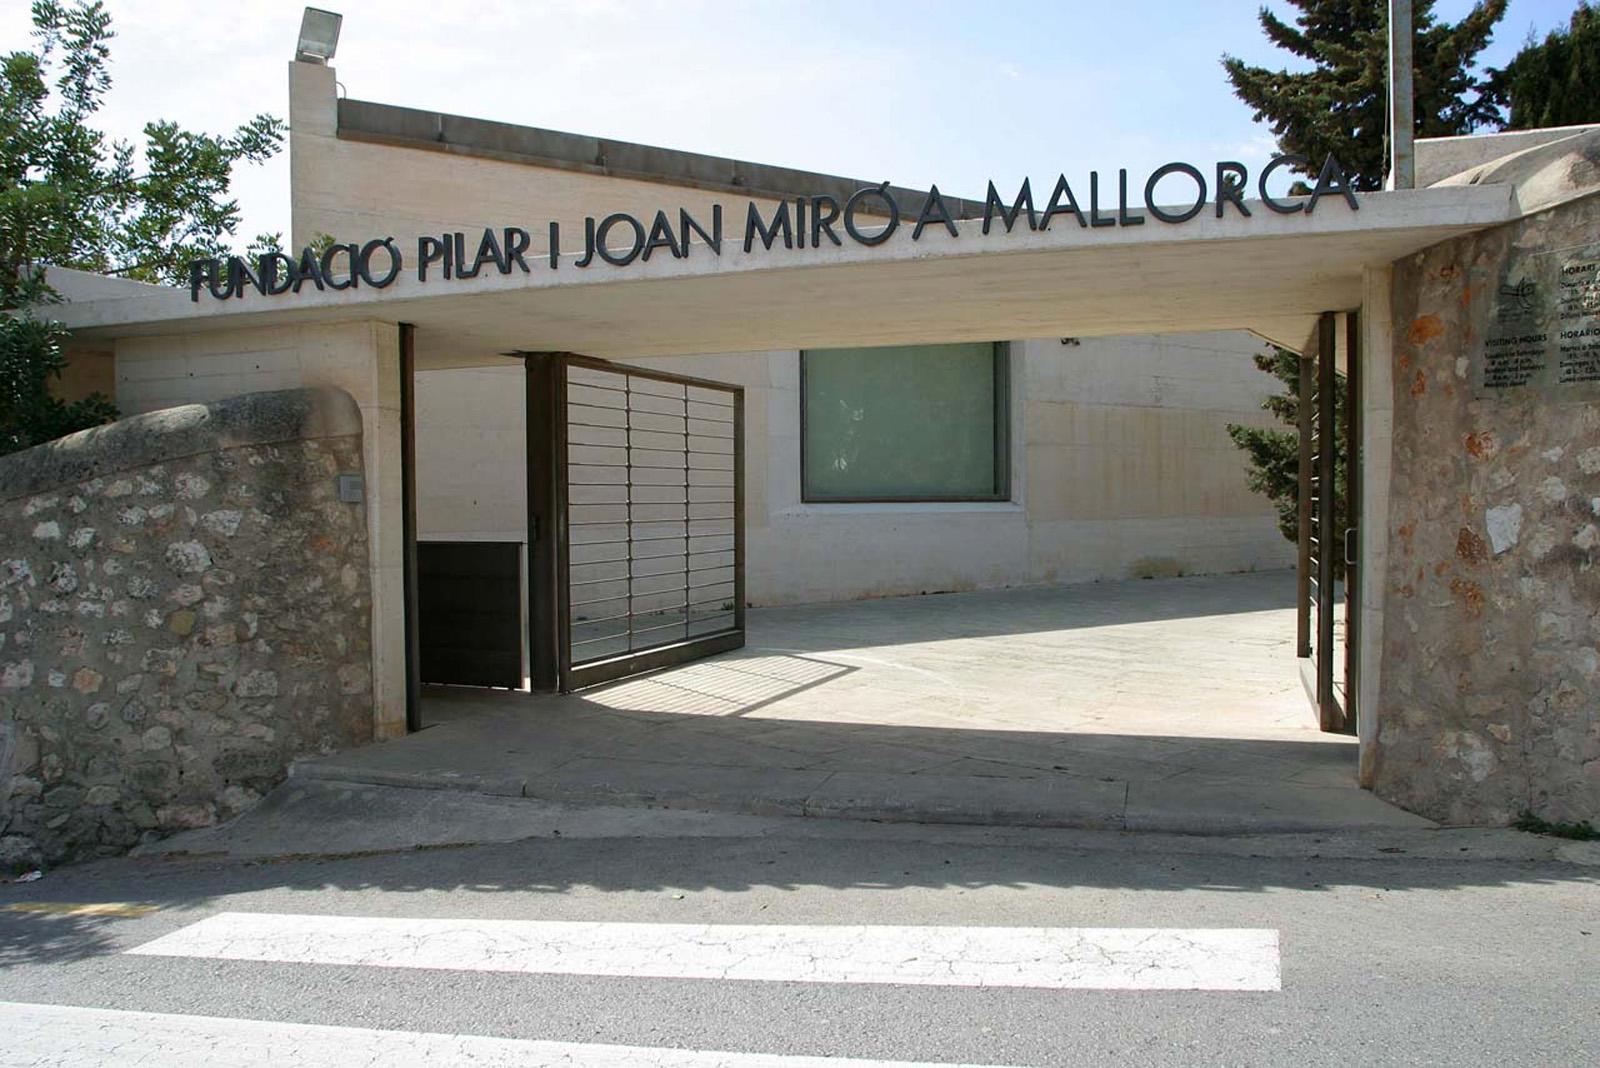 Meandros y Poliedros: Fundació PIlar i Joan Miró a Mallorca